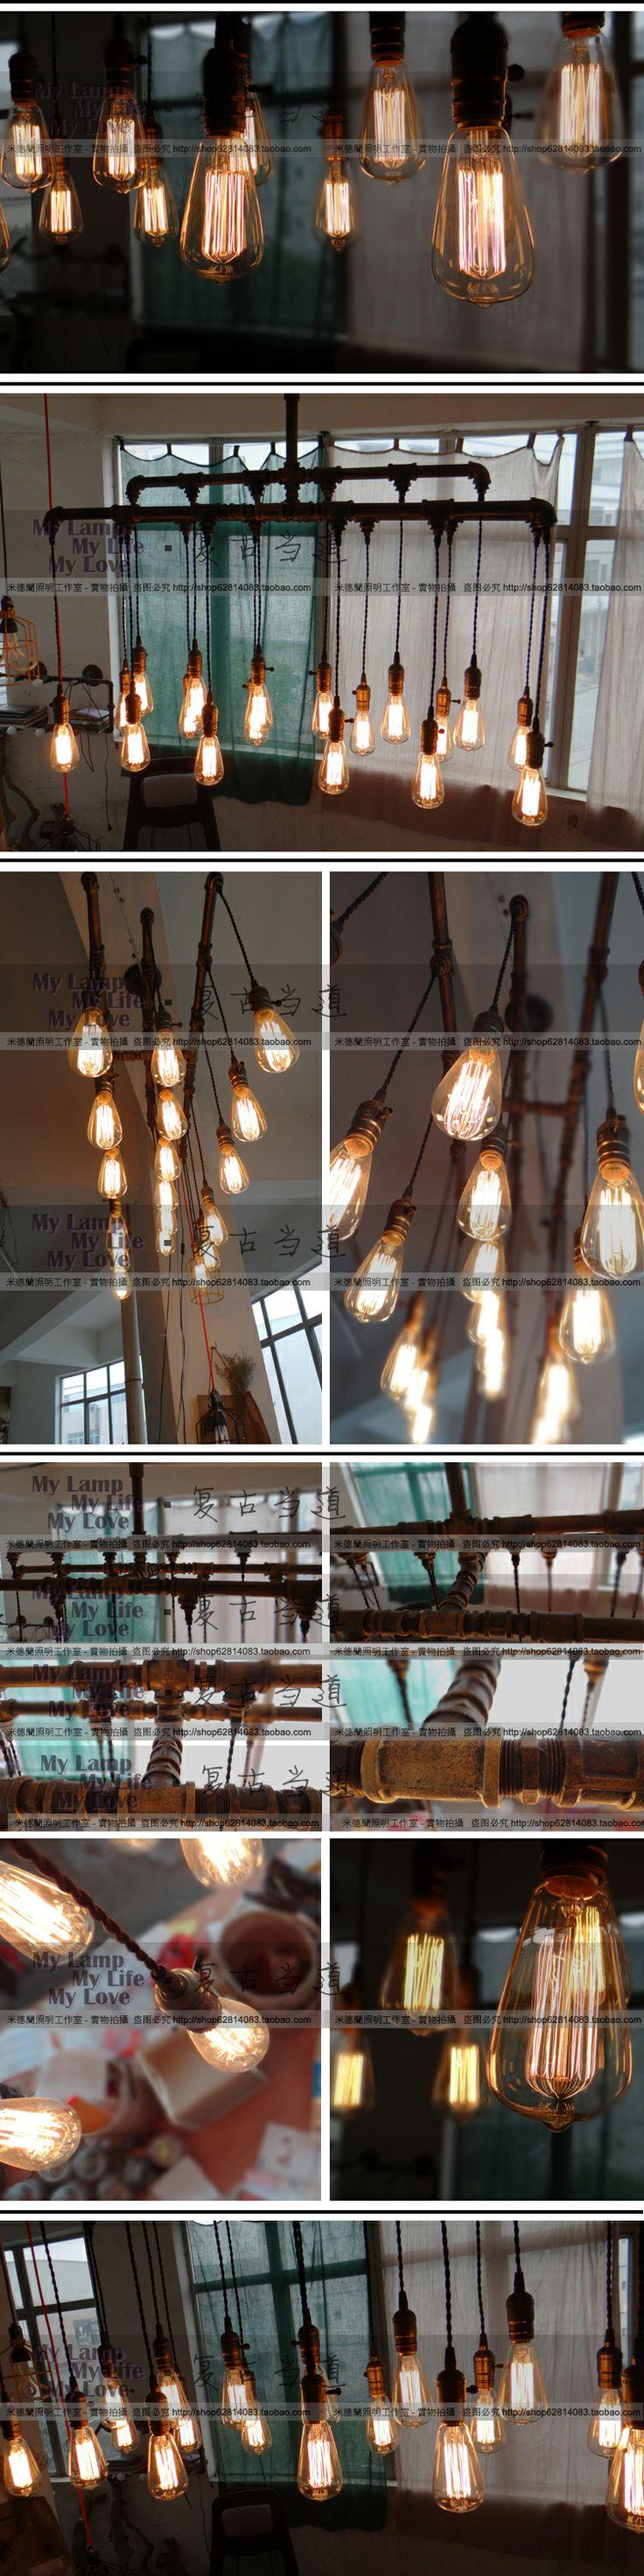 31 best lighting images on pinterest light fixtures pendant february 20 edison bulbs shipped e27 retro punk style iron pipes loft chandelier lamp arubaitofo Image collections